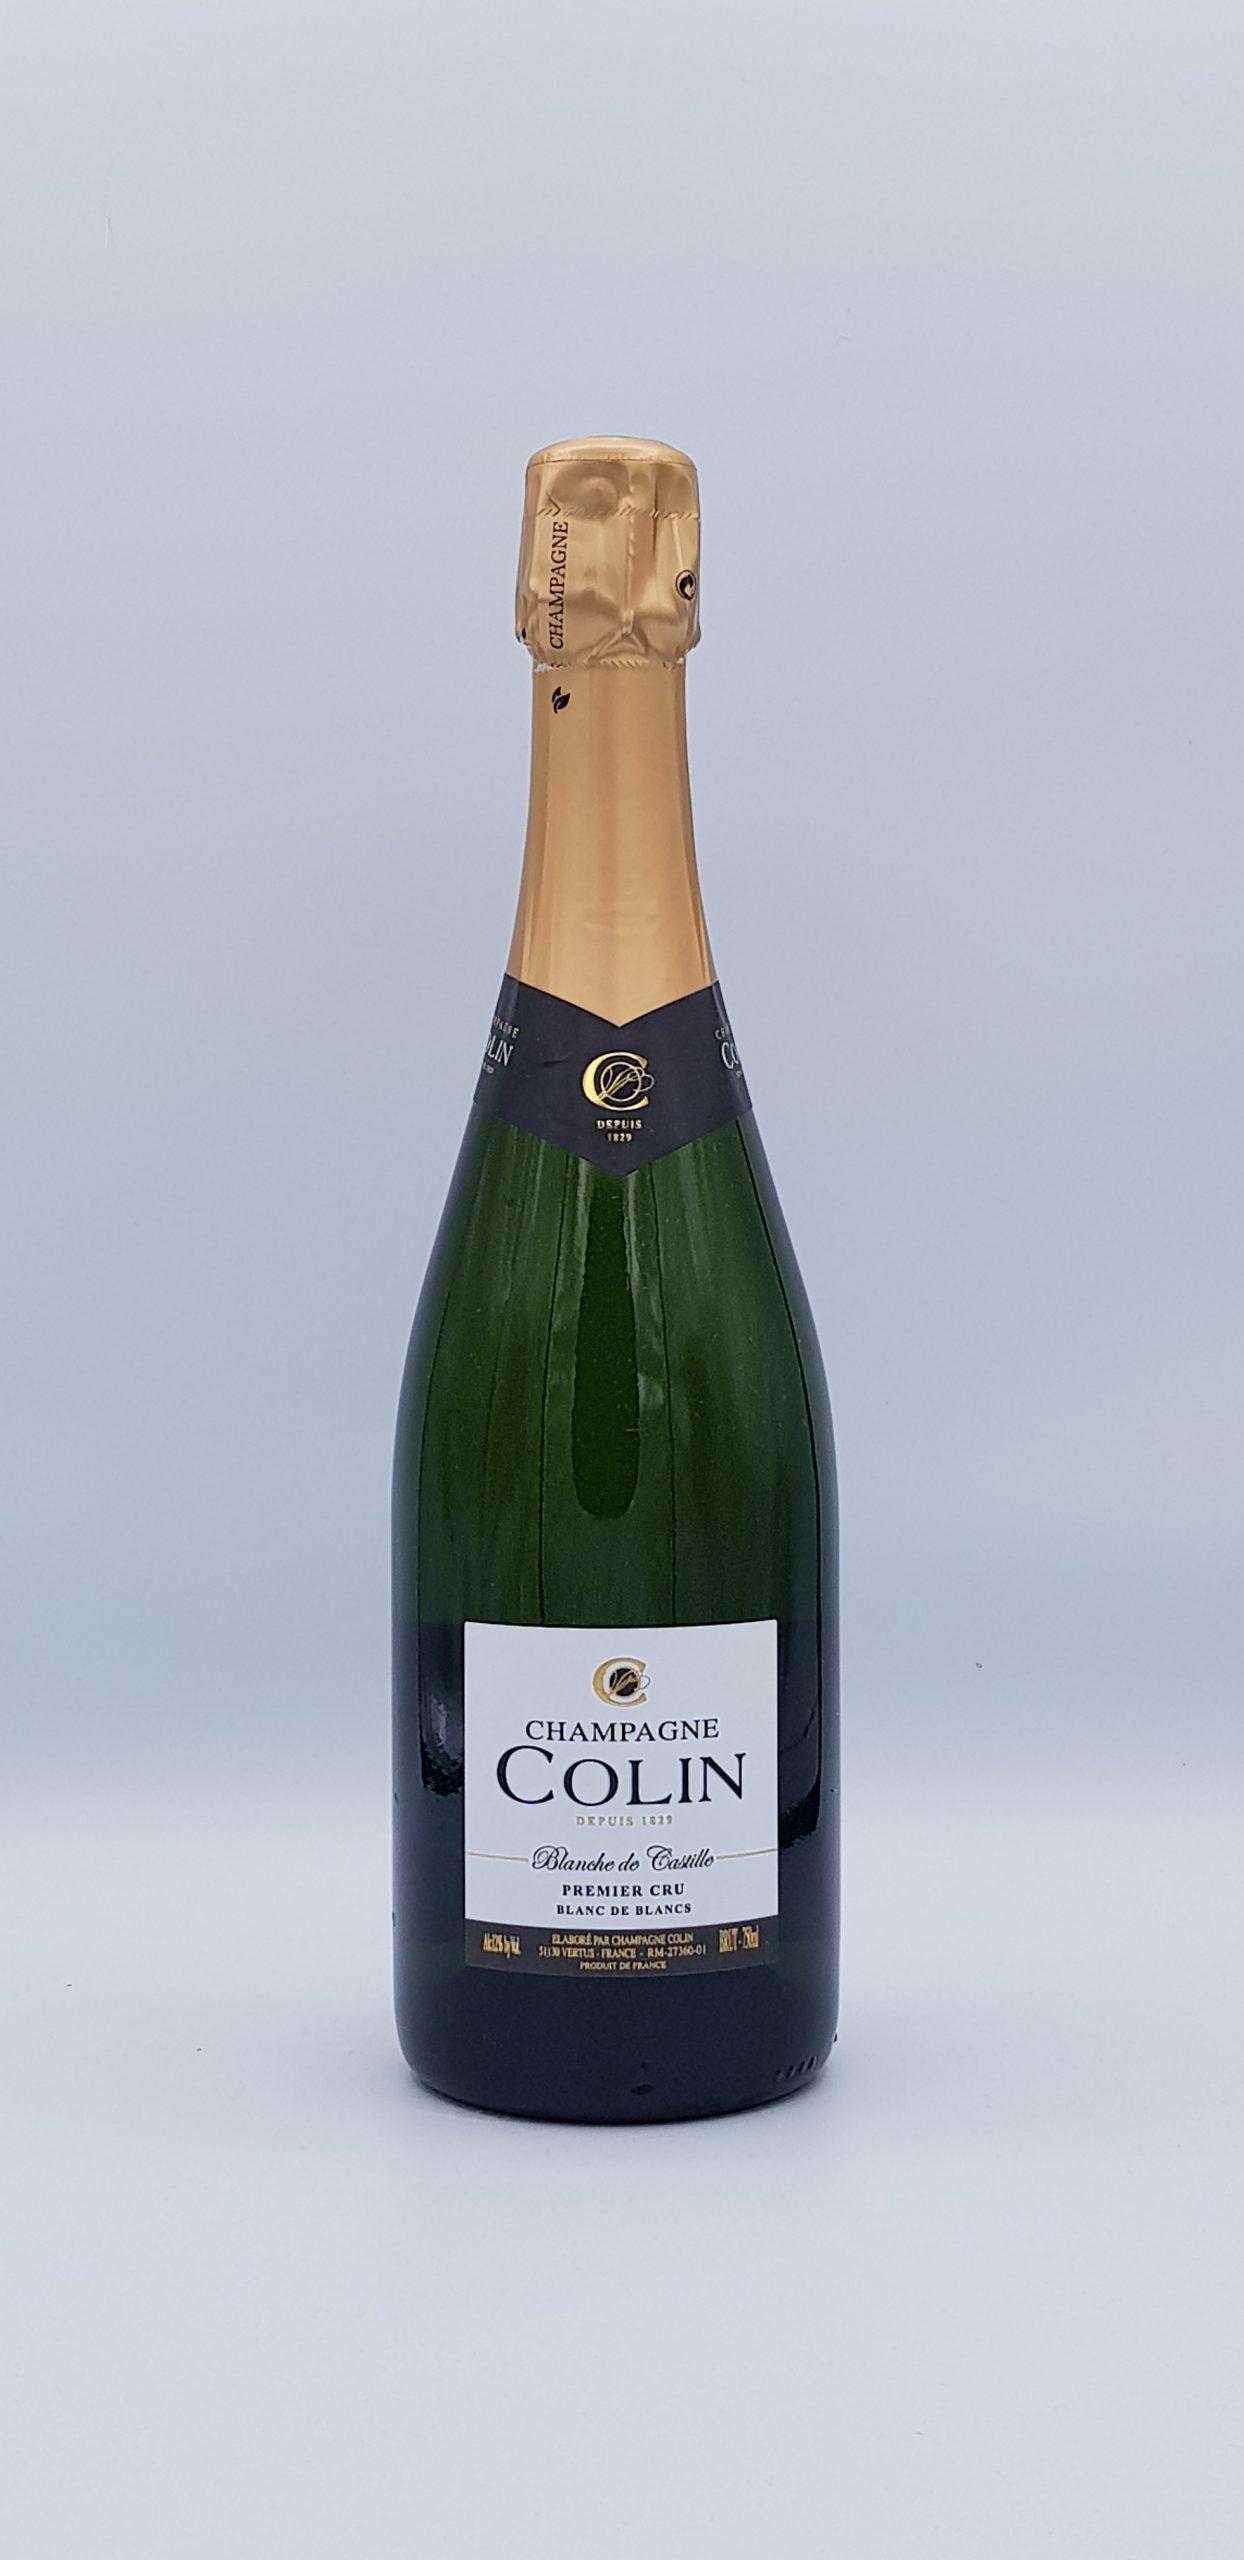 Champagne Colin Blanche De Castille 1Er Cru